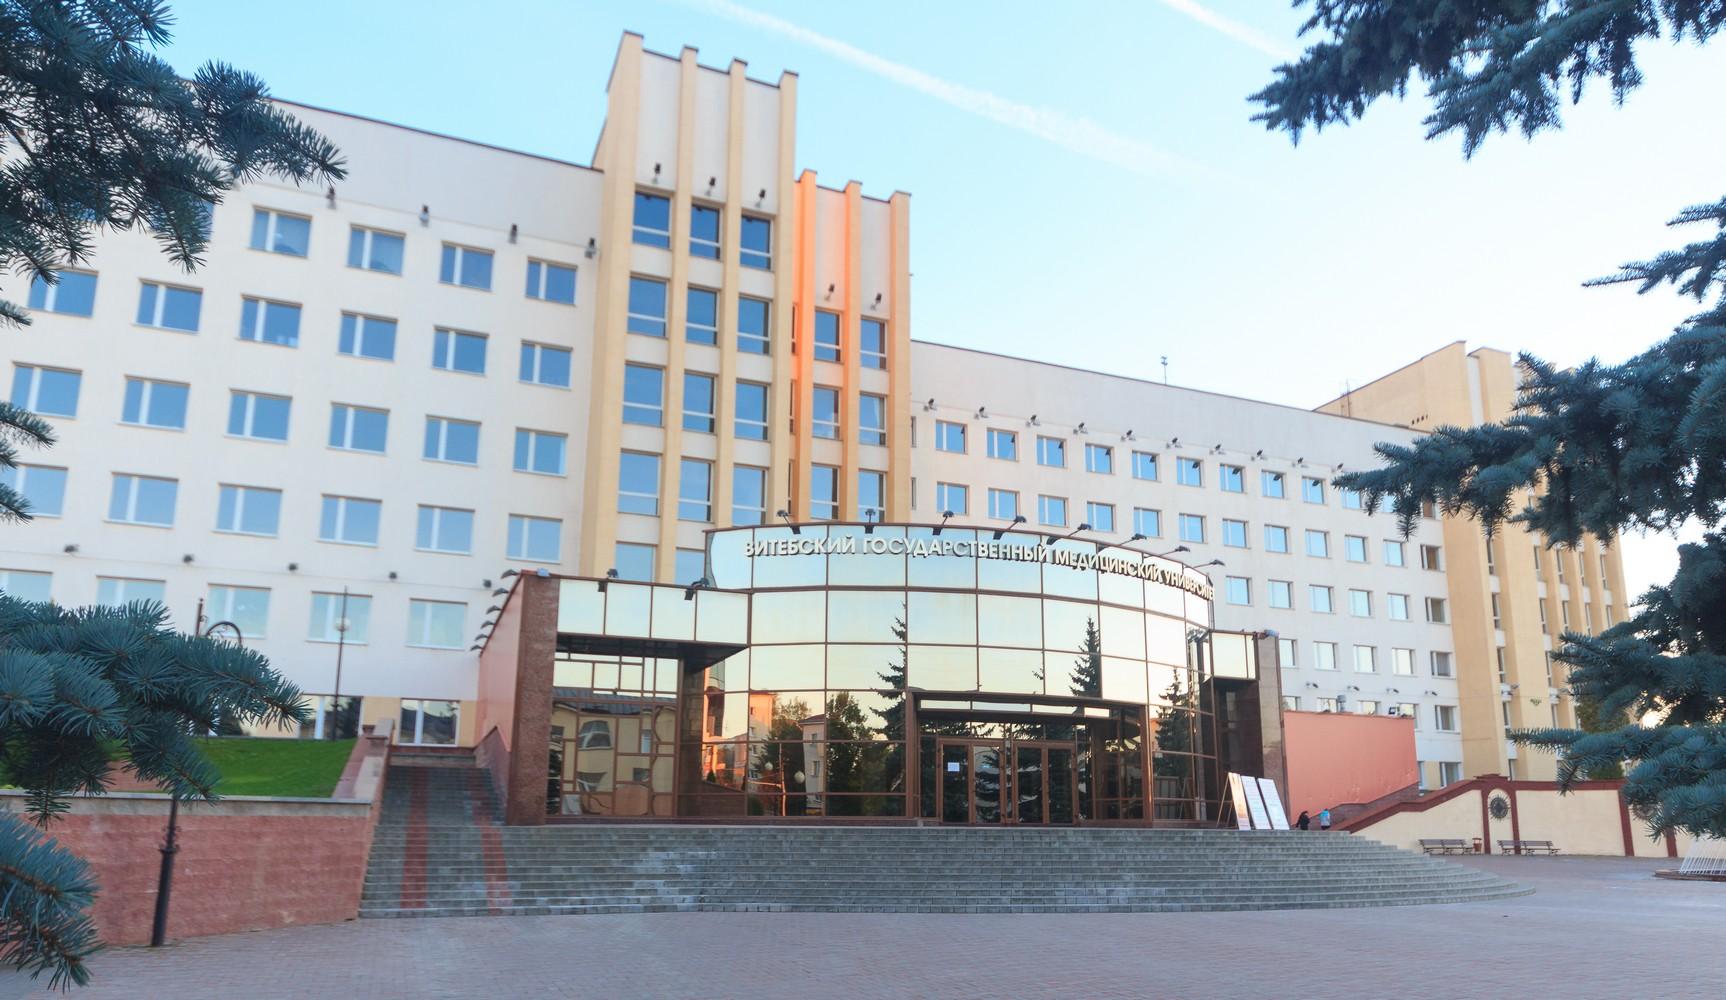 VITEBSK STATE MEDICAL UNIVERSITIES